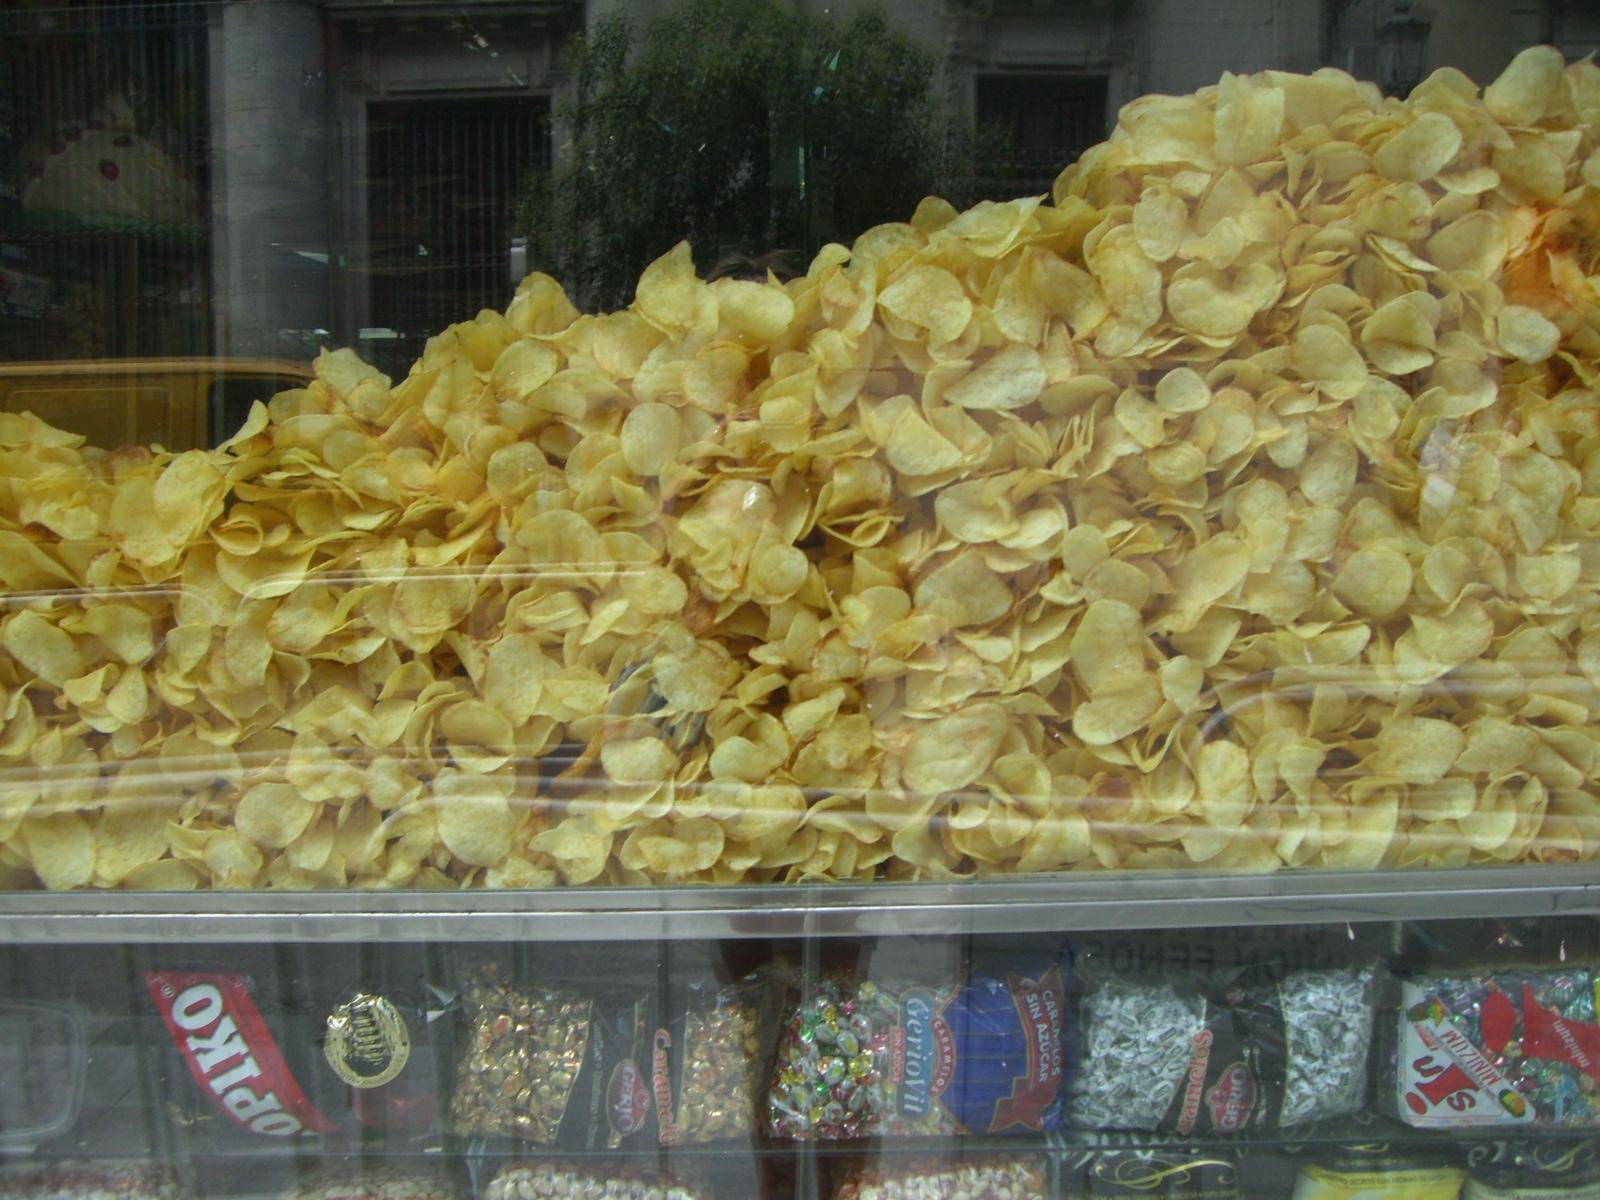 The Spaniards really dig on potato chips (patatas fritas)